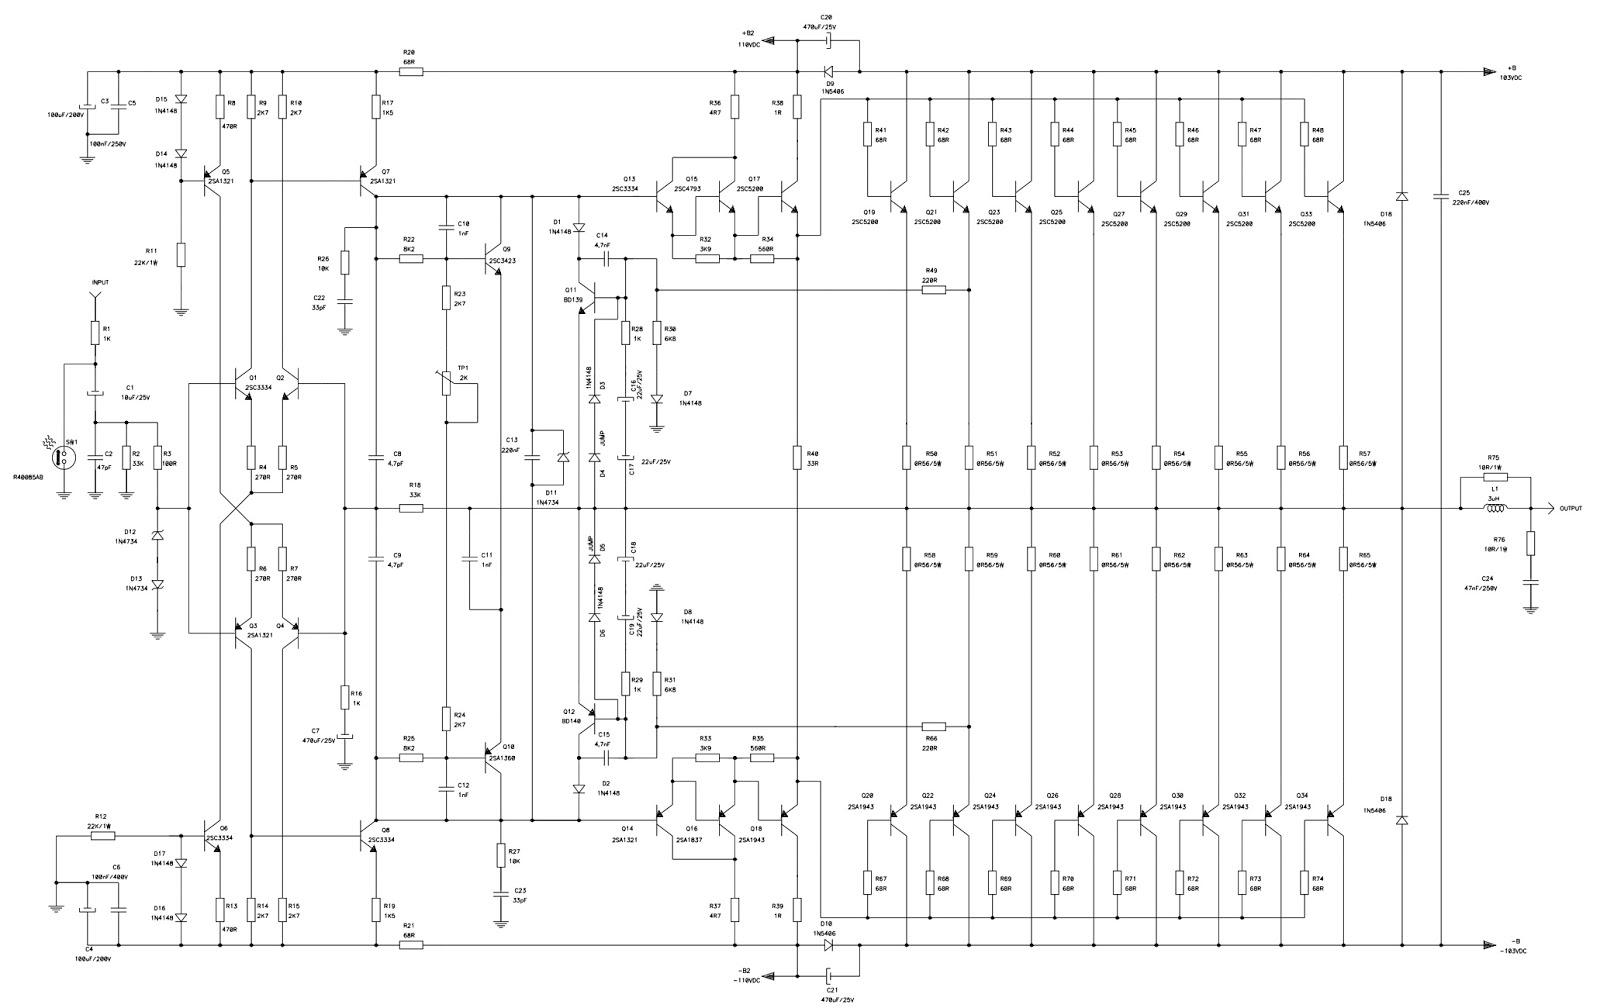 Pro Audio Wiring Diagrams 98 Audi A4 Fuse Diagram Attack 6400  Professional Power Amplifier Circuit